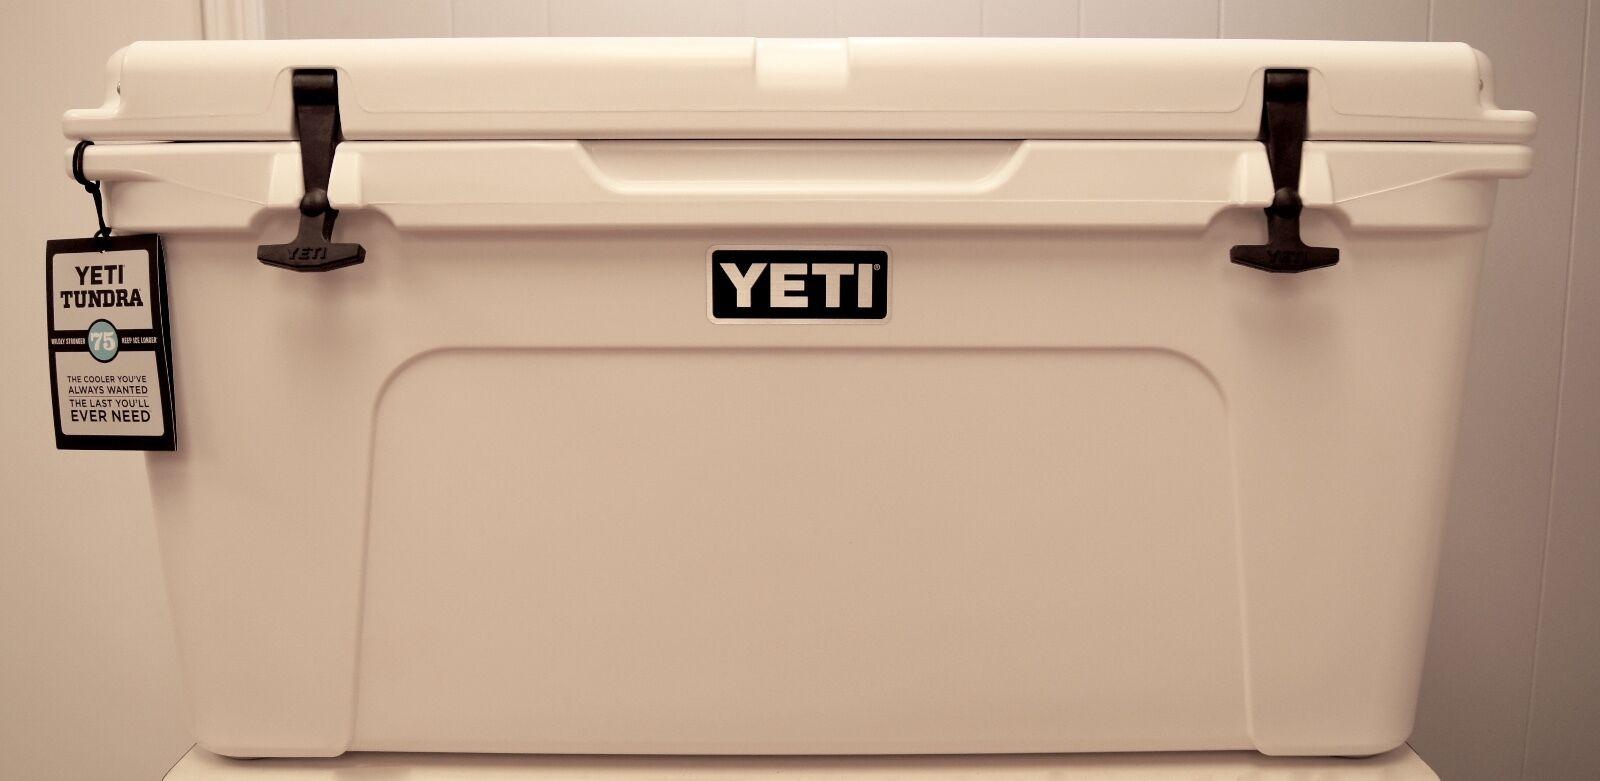 BRAND NEW  YETI Tundra 75 Quart Cooler White Free Shipping  YT75W  clearance